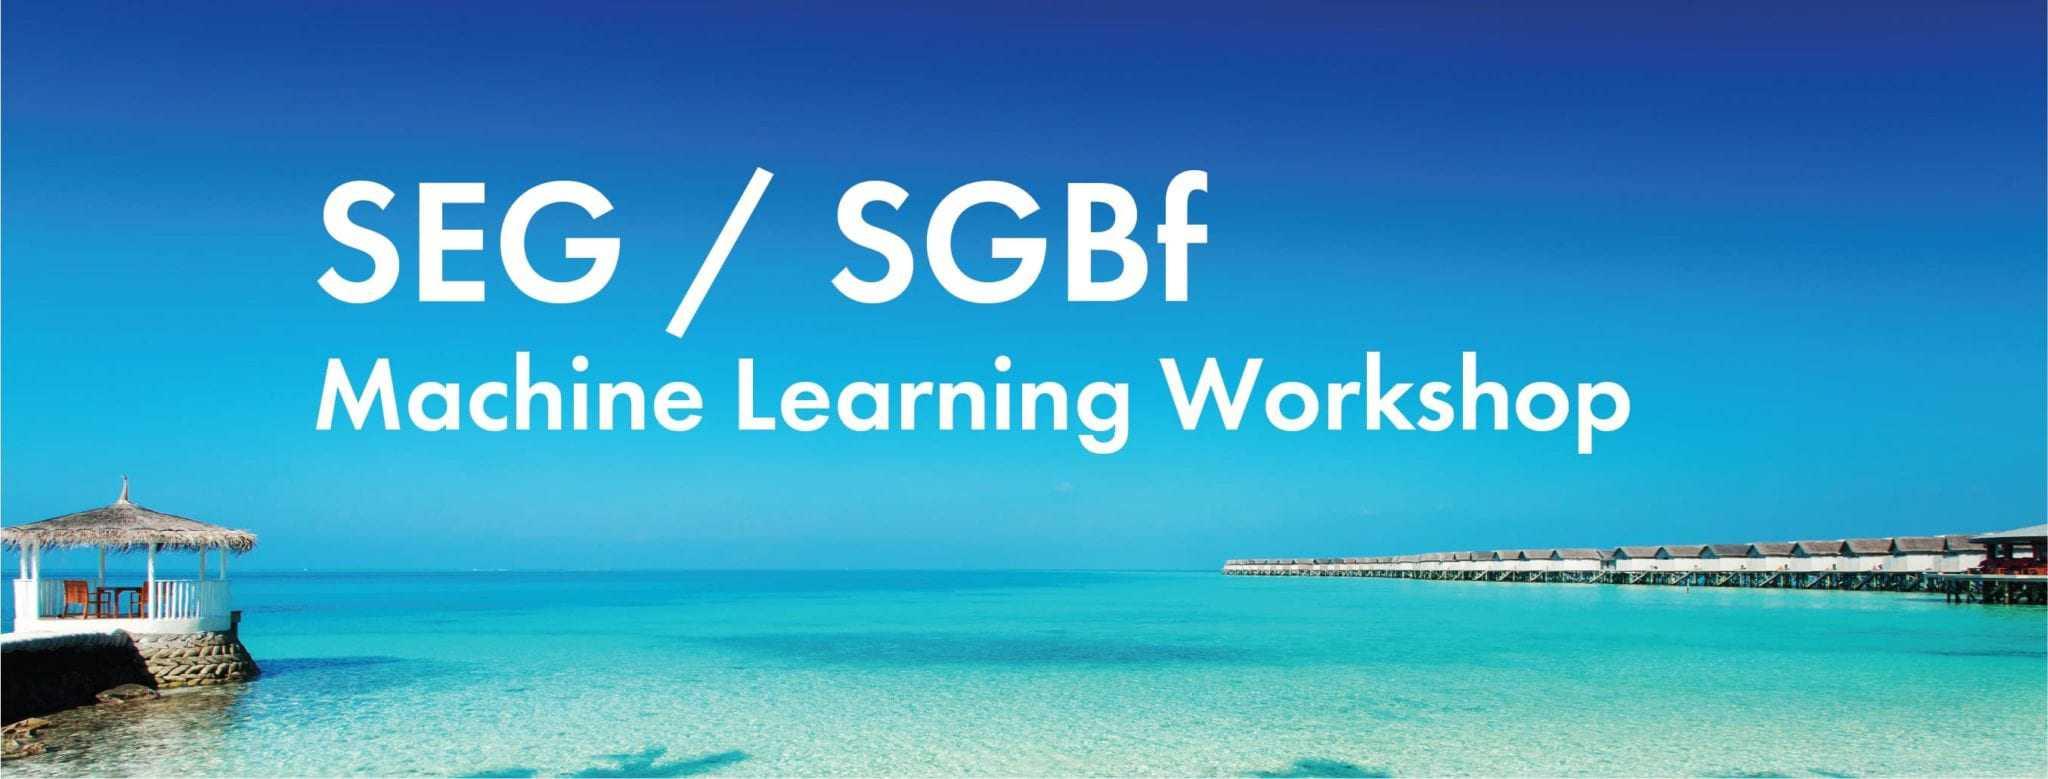 SEG/SBGf - Machine Learning Workshop